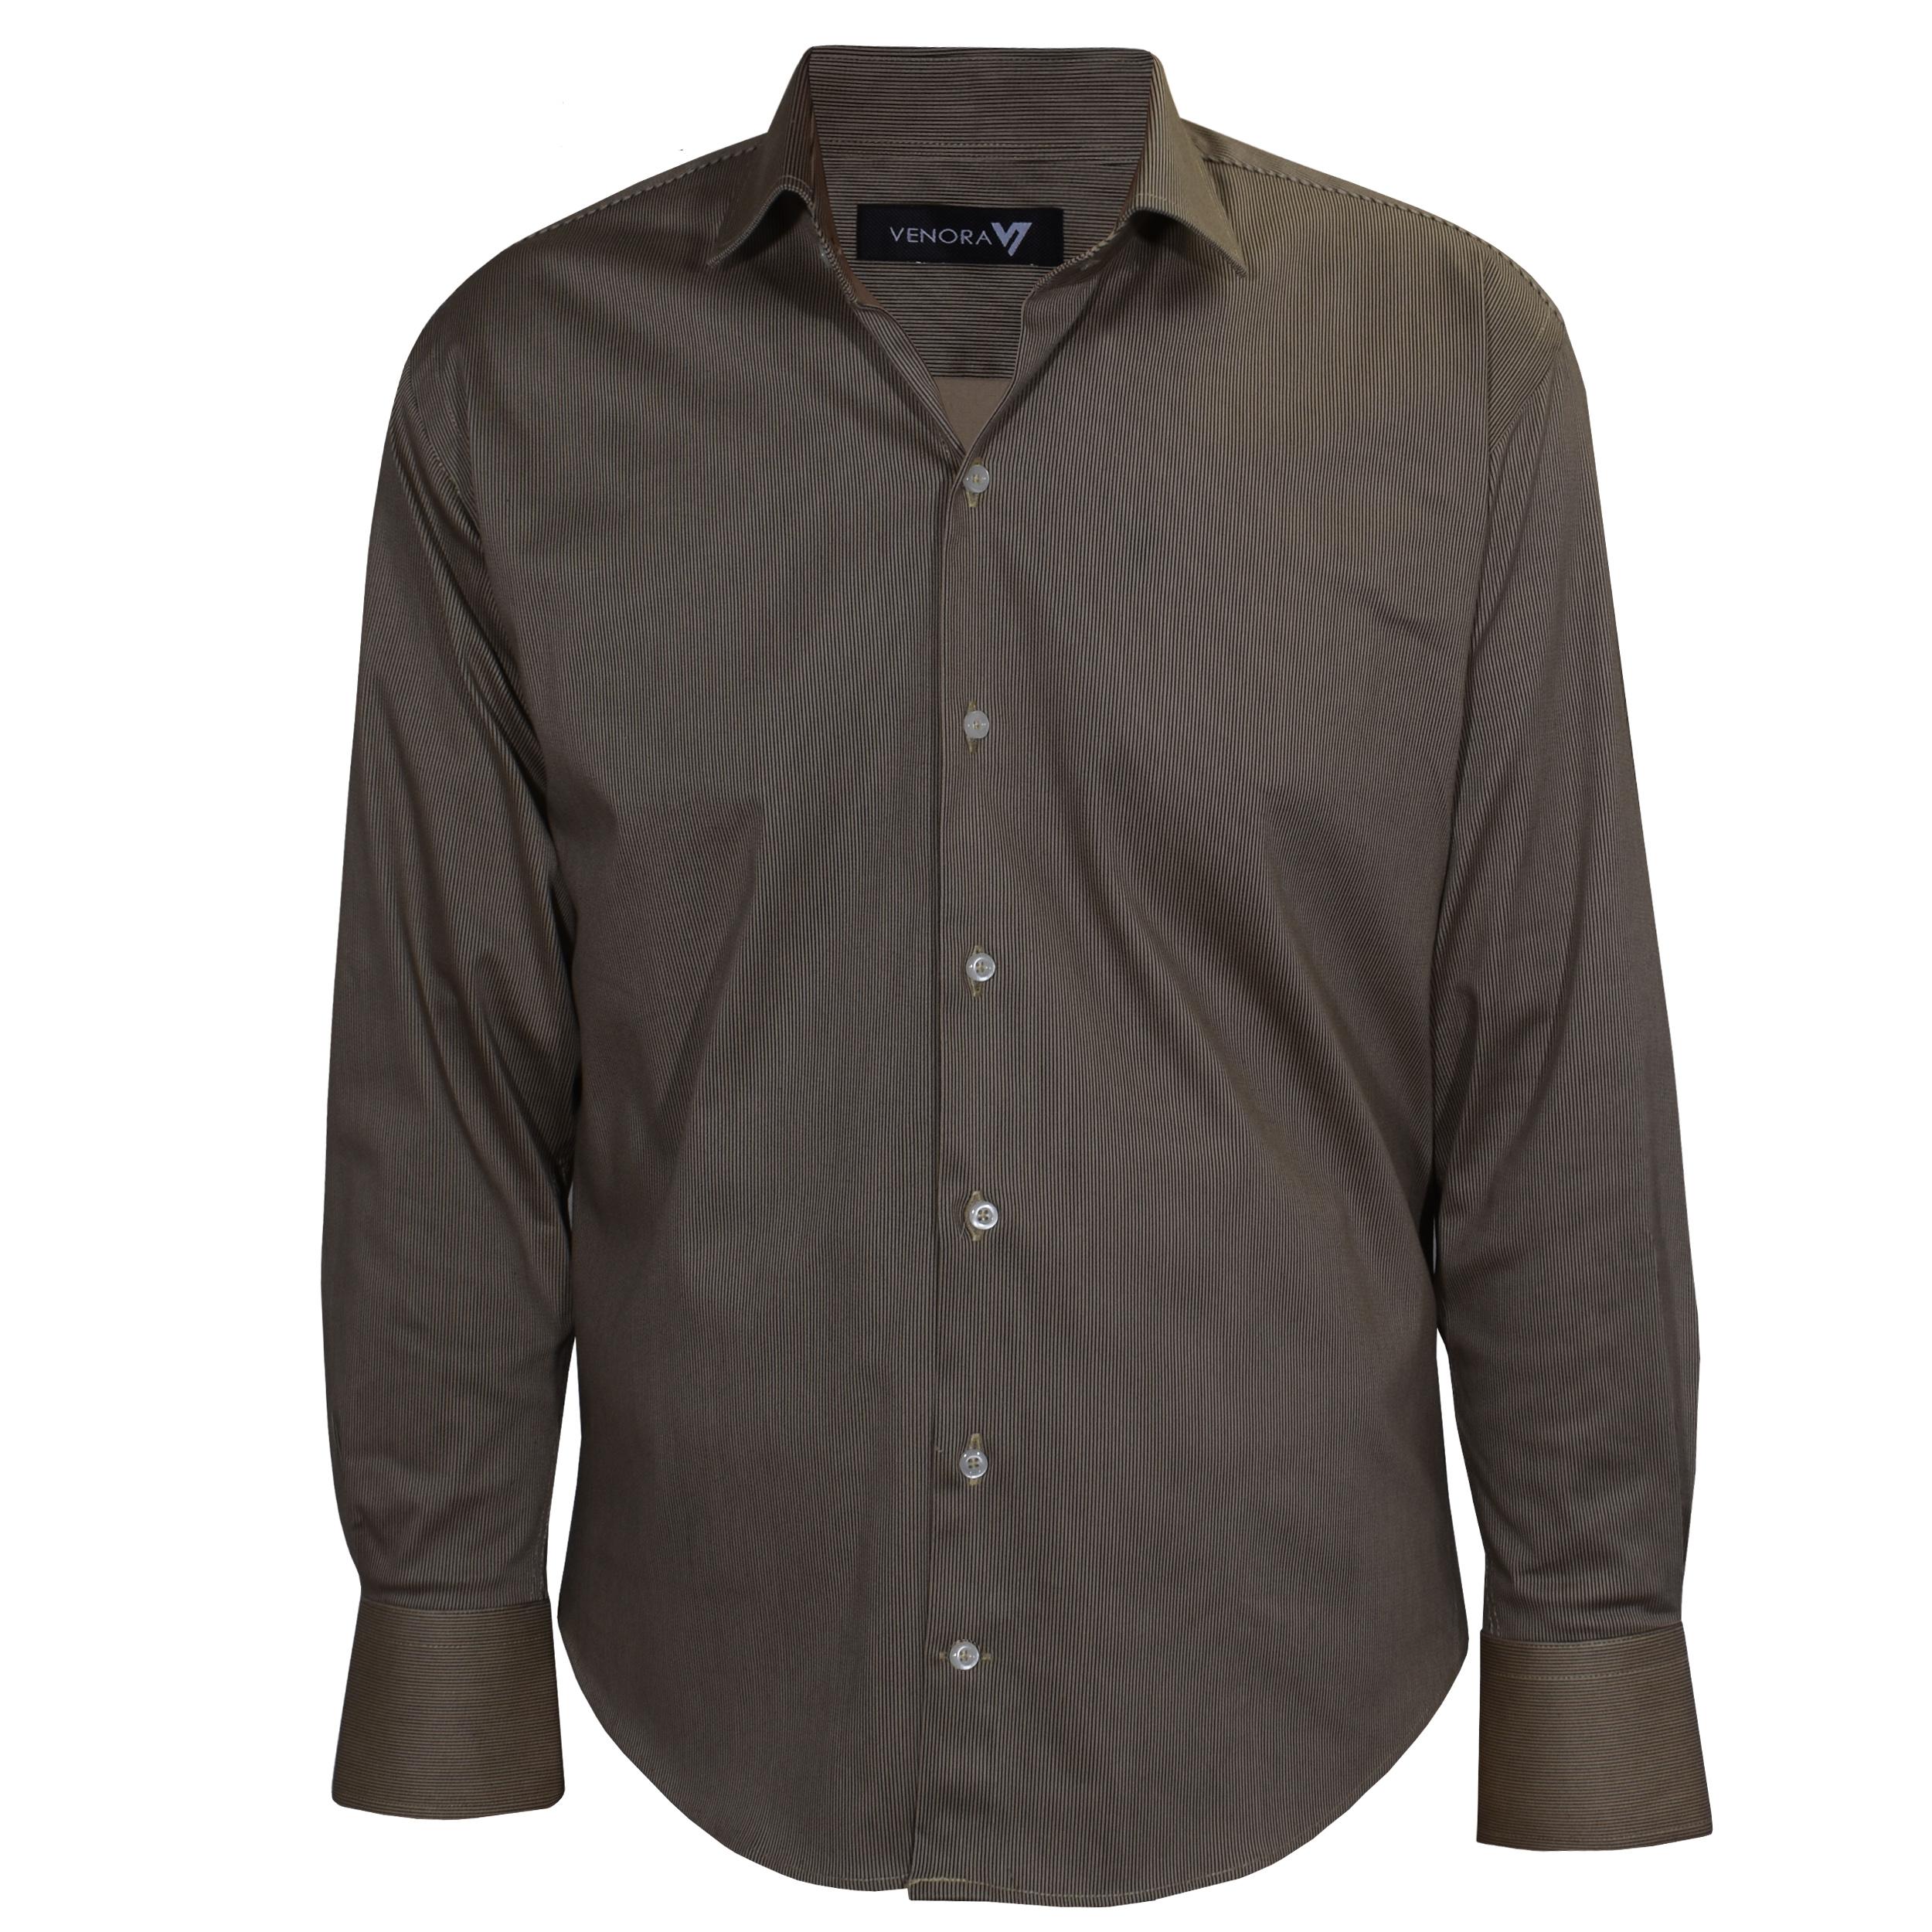 پیراهن آستین بلند مردانه ونورا کد NB222-COL1